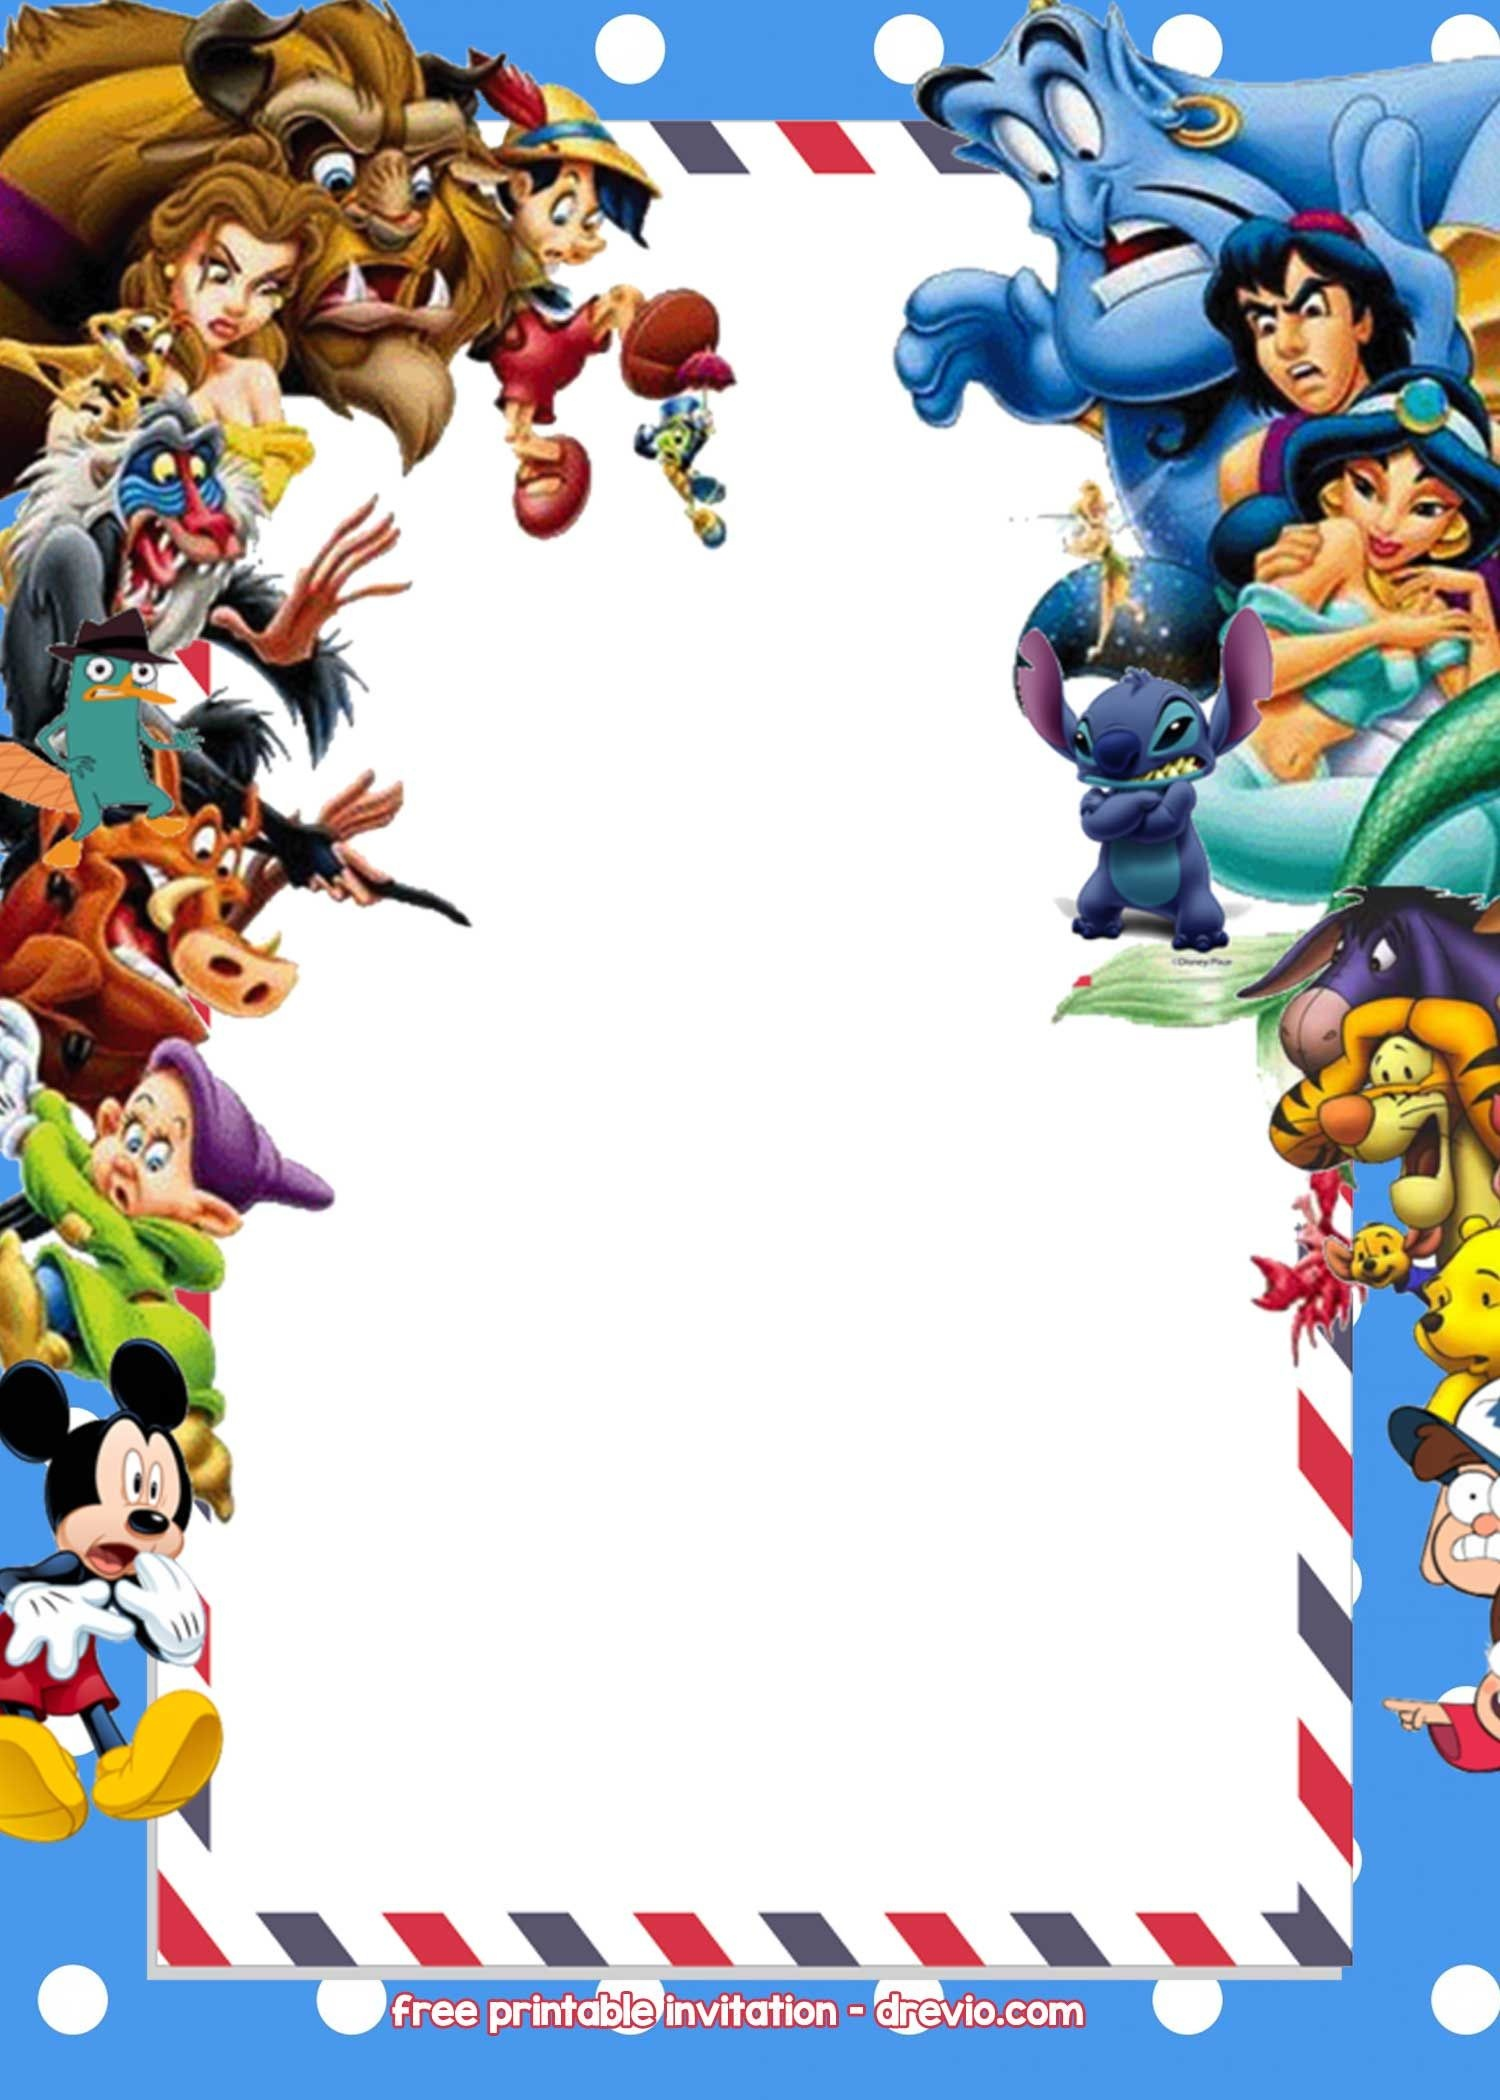 Free Disney Invitations | Free Printable Birthday Invitation - Free Printable Disney Invitations